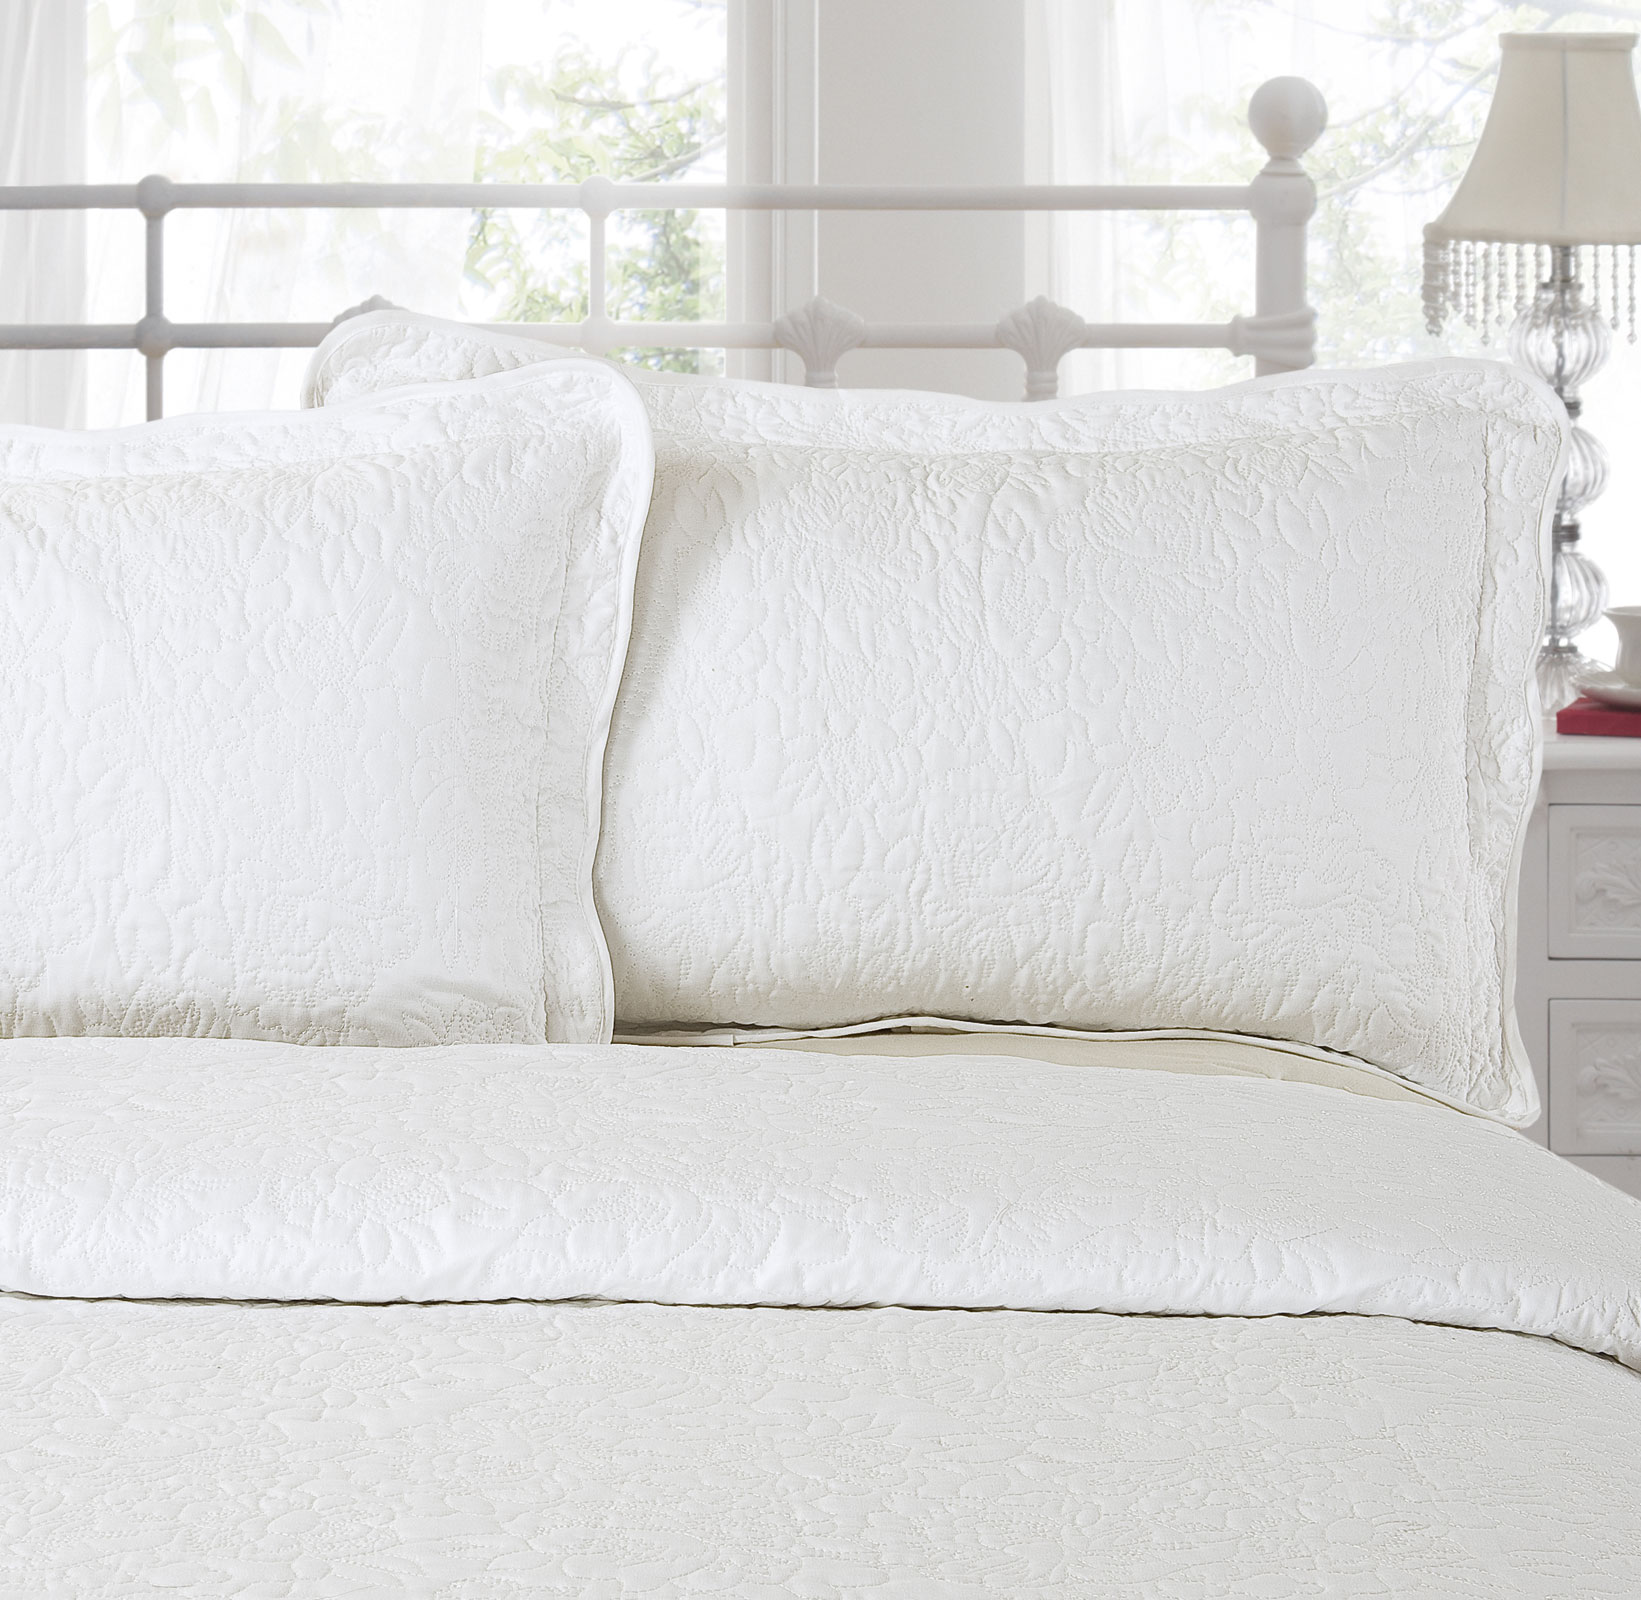 highams luxuri s bestickt kissenbezug kissenbez ge vintage farben ebay. Black Bedroom Furniture Sets. Home Design Ideas